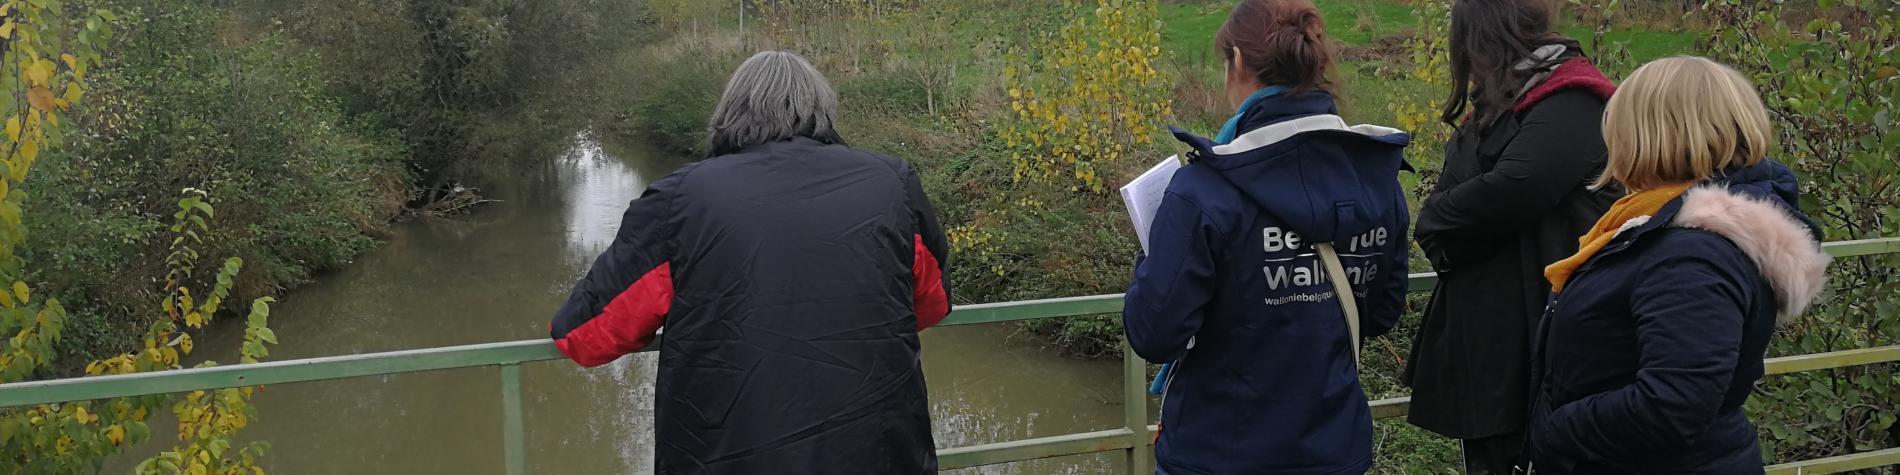 Balade nature-Vallée des Oiseaux-Rebecq